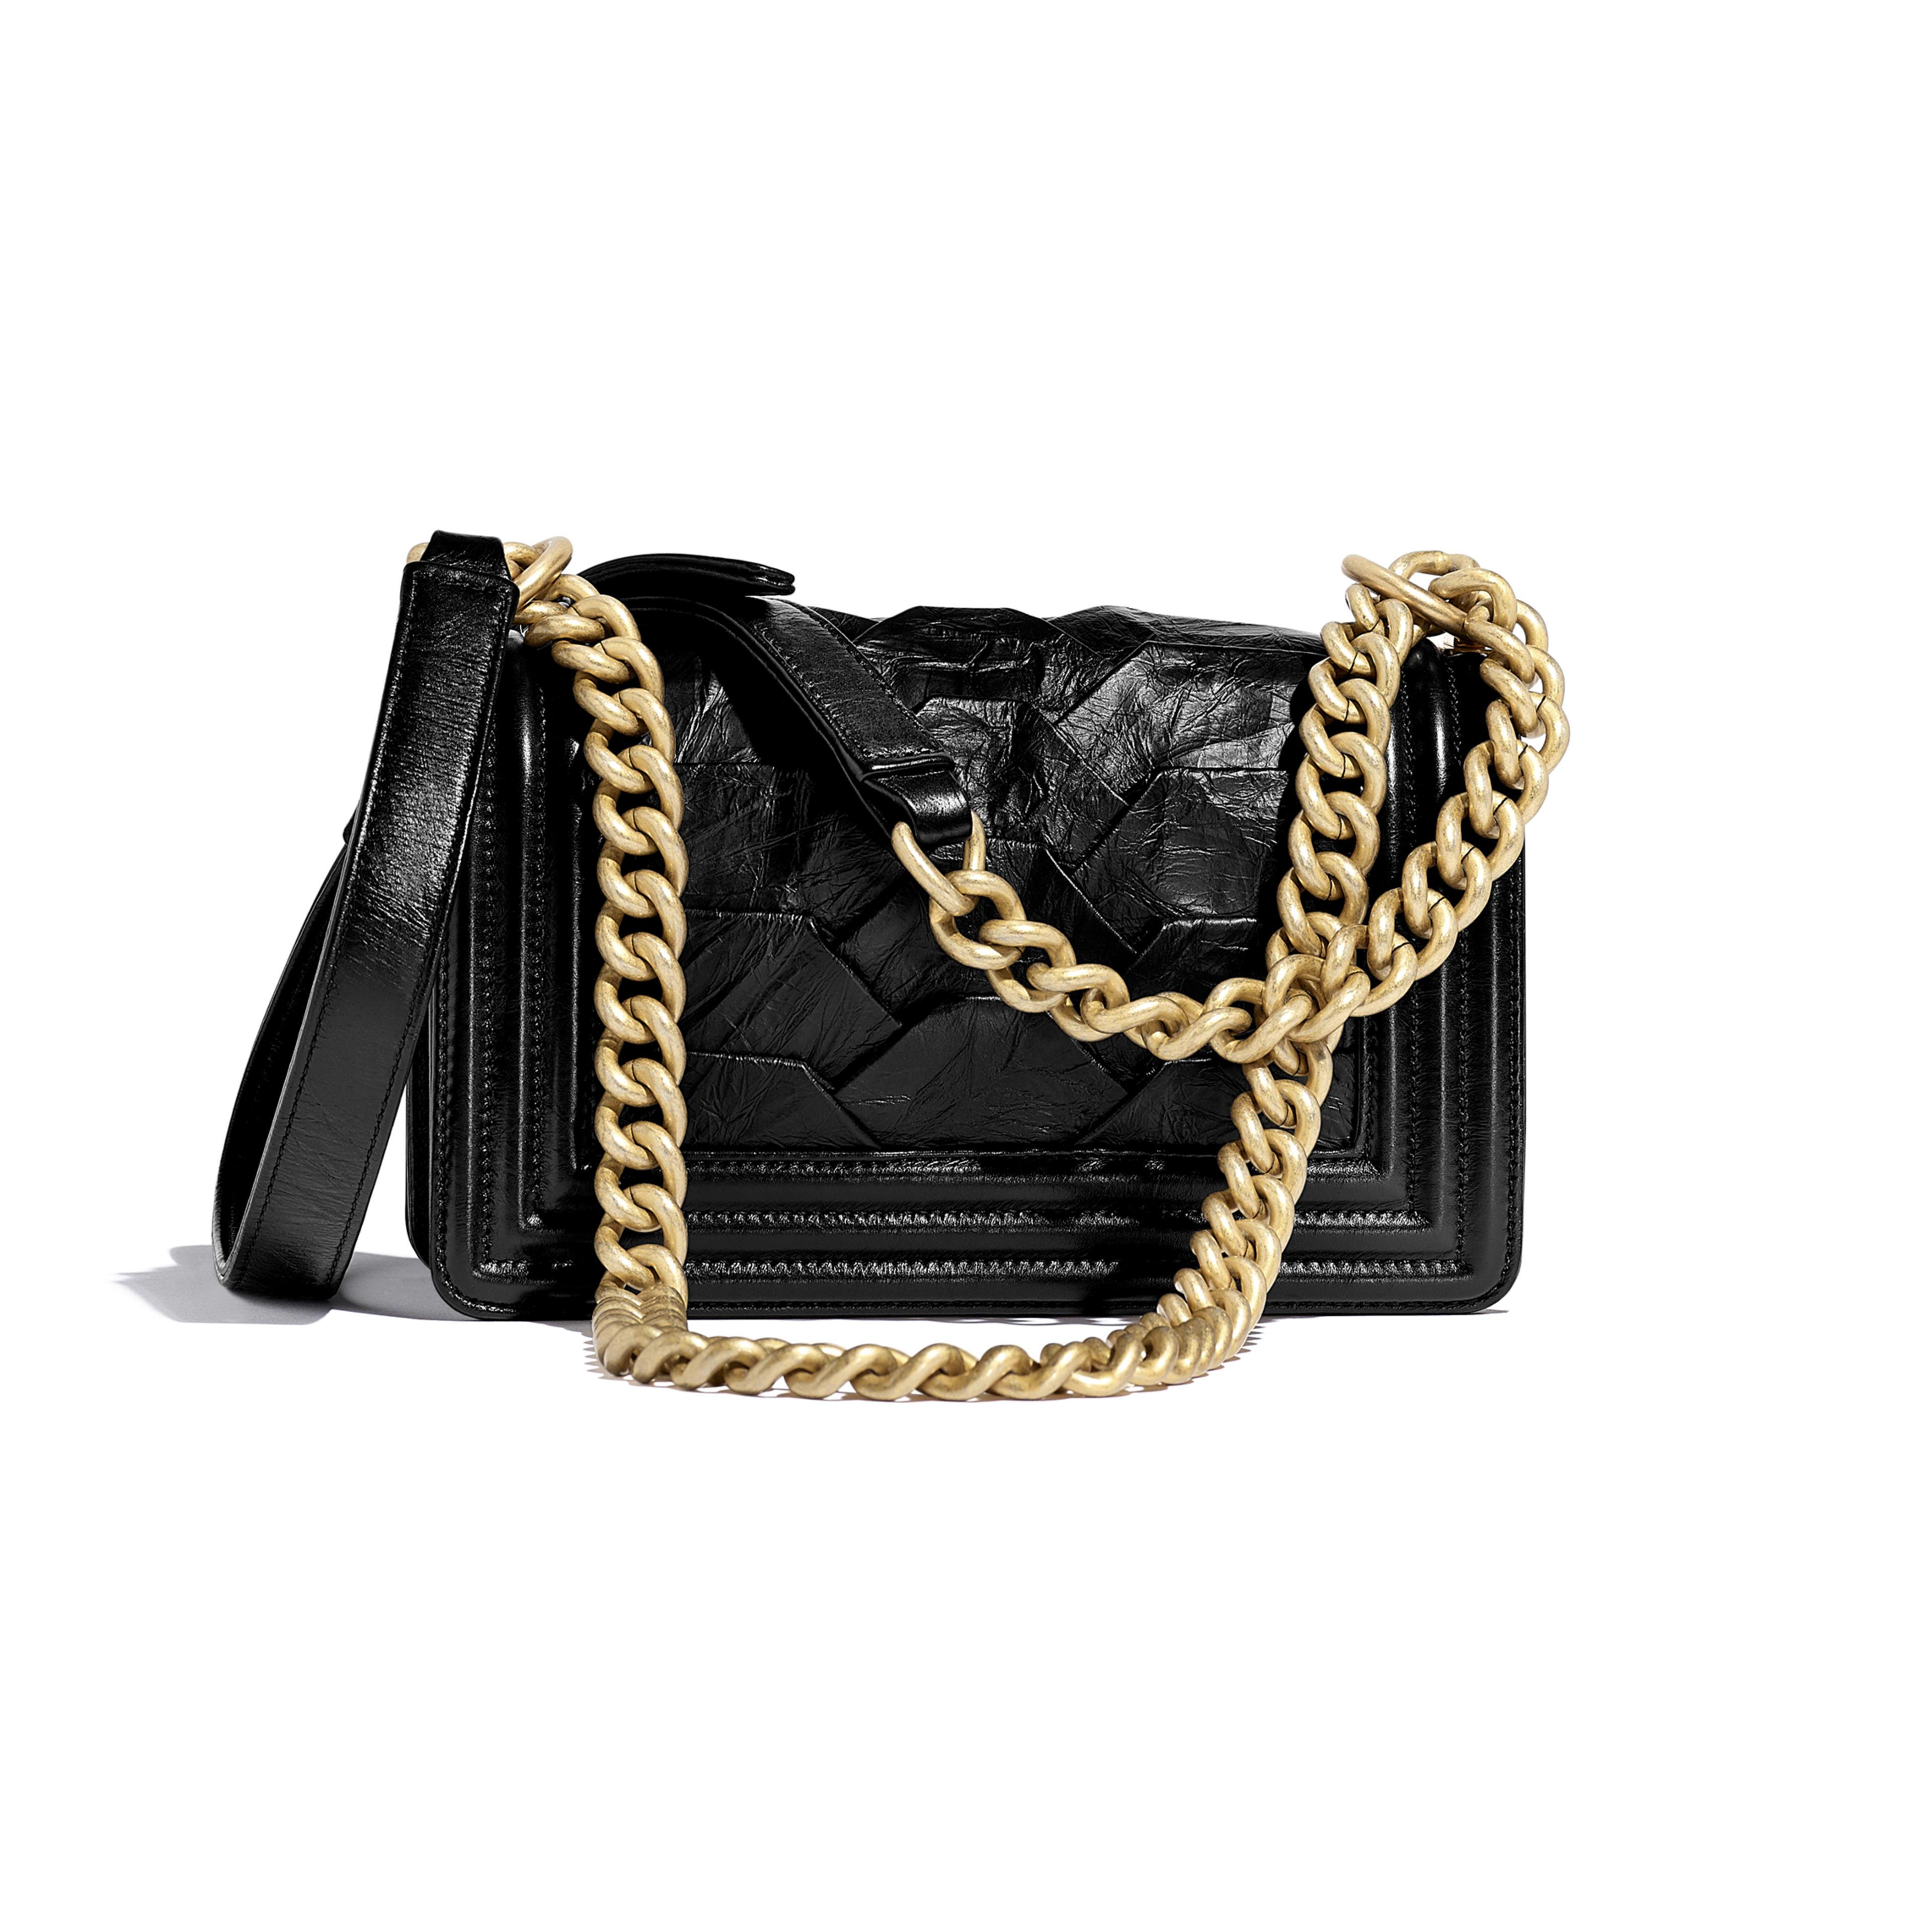 Small BOY CHANEL Handbag - Black - Crumpled Calfskin & Gold-Tone Metal - Alternative view - see full sized version